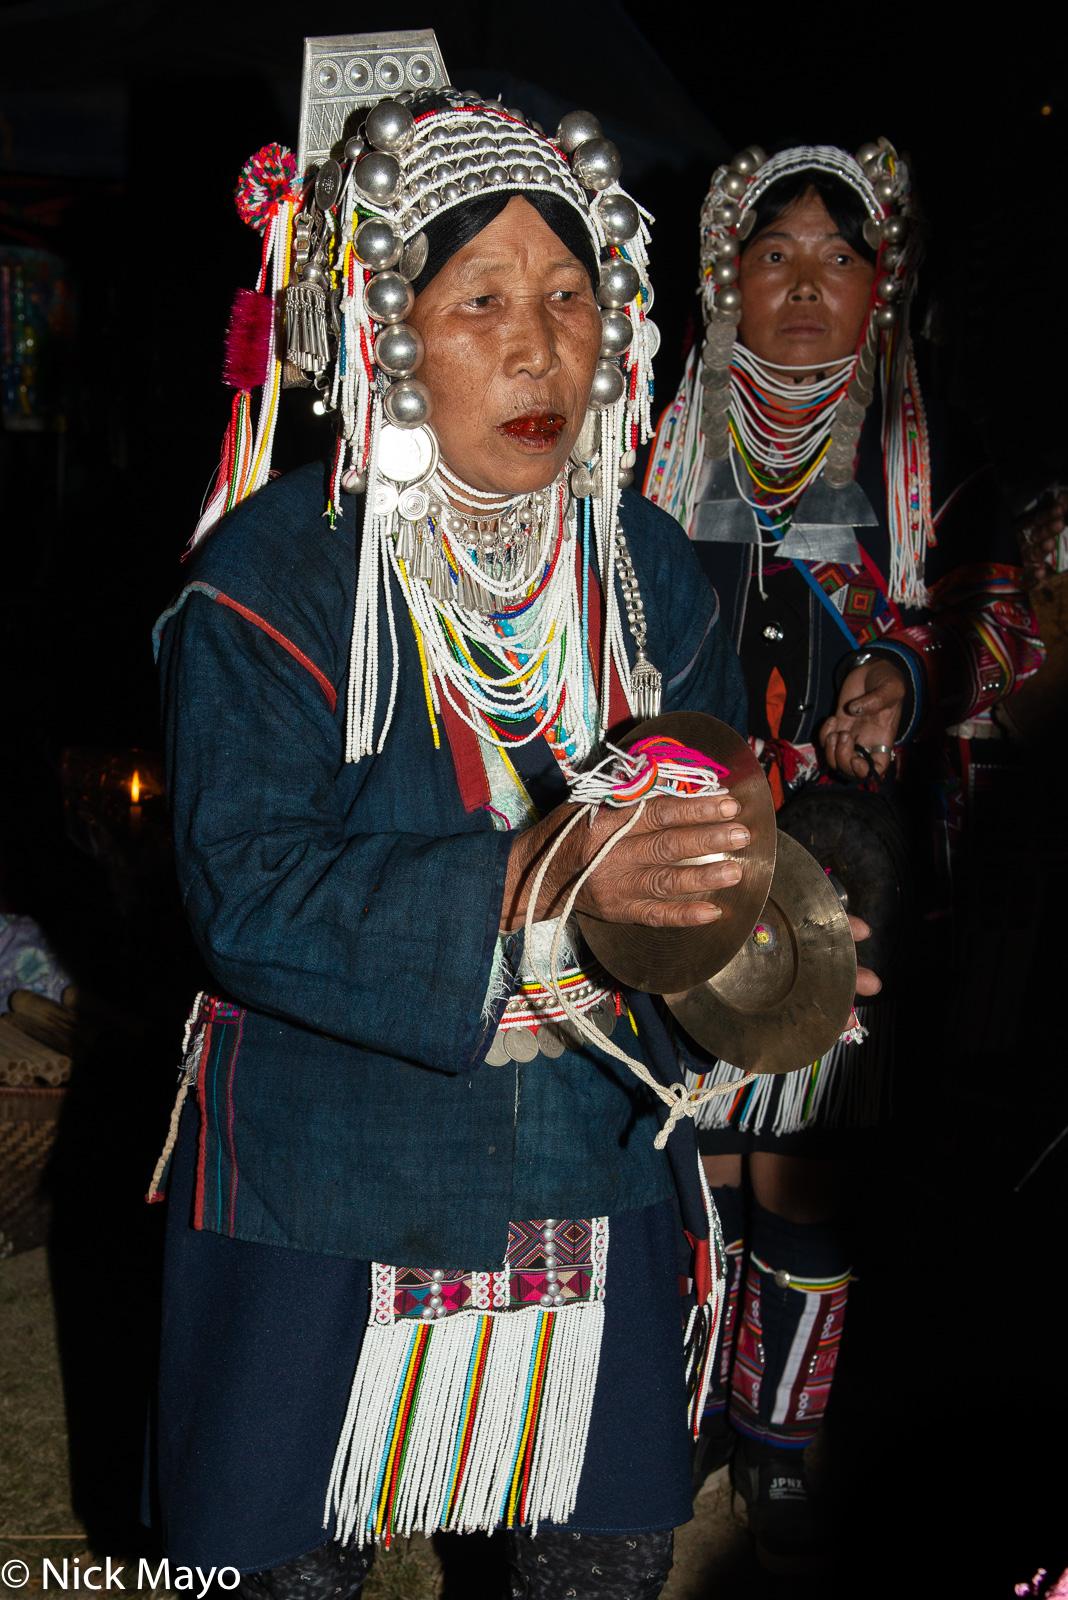 Burma, Circling, Cymbals, Festival, Hani, Shan State, photo